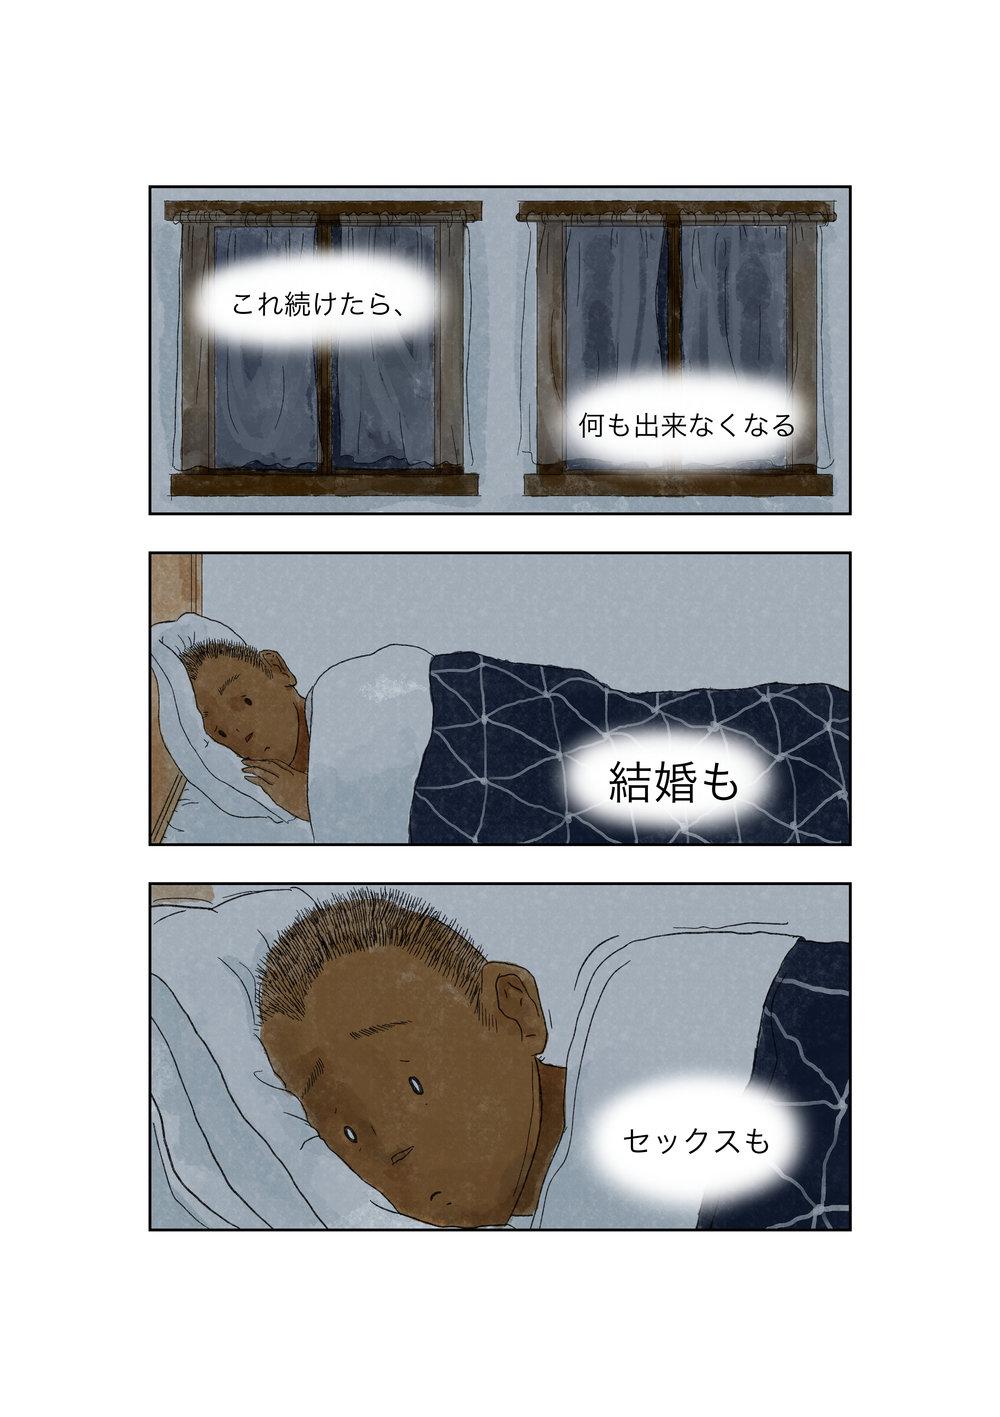 project_3_004.jpg